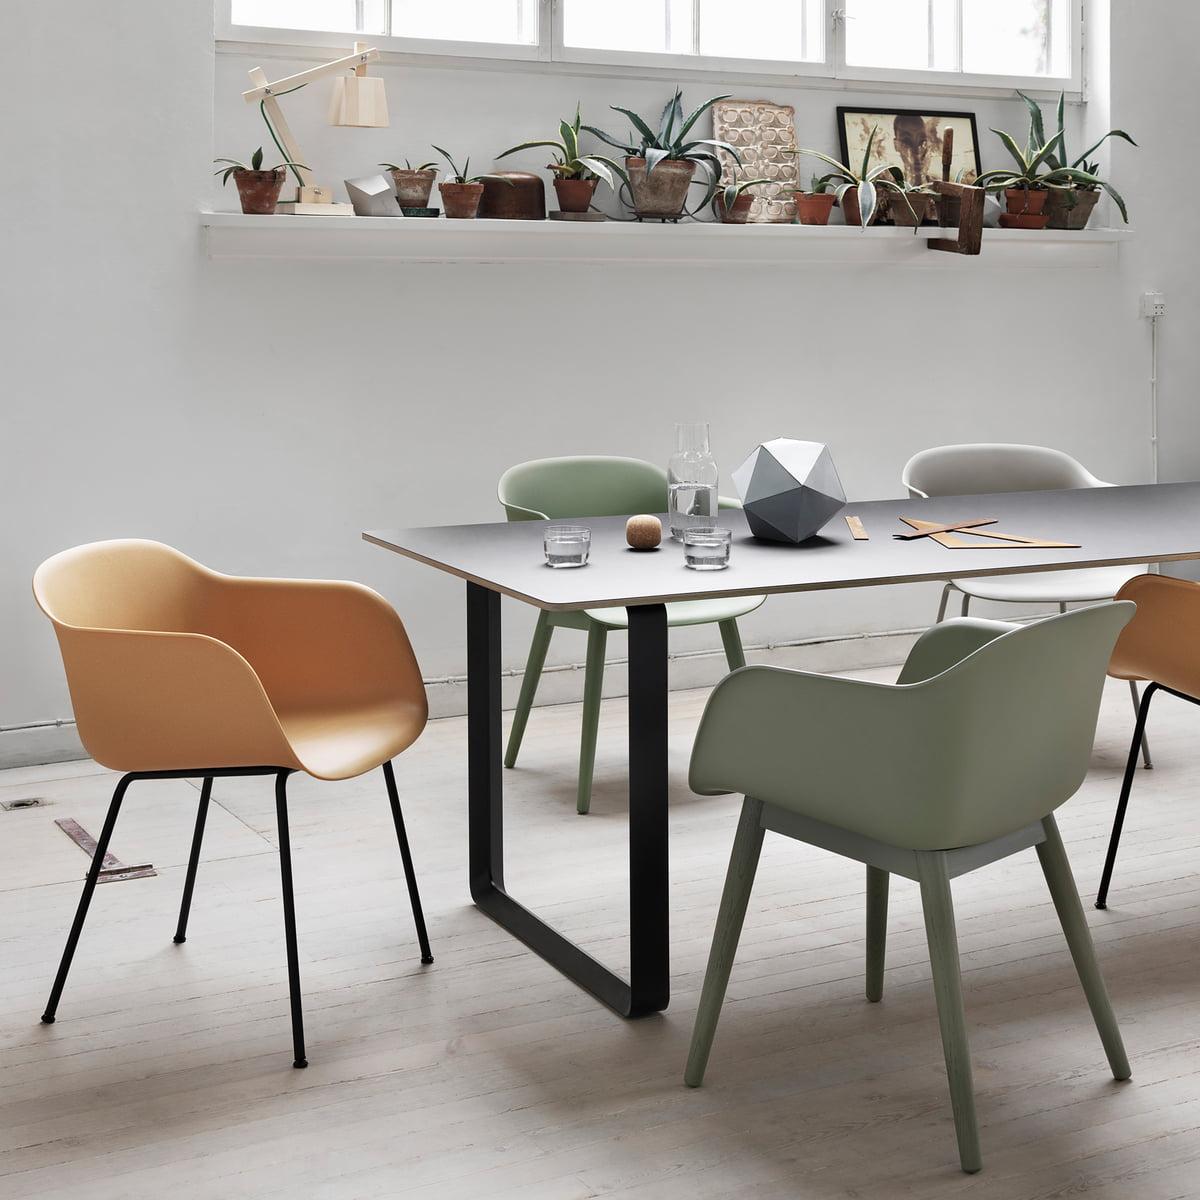 Muuto Fiber Chair Group Fiber Chair